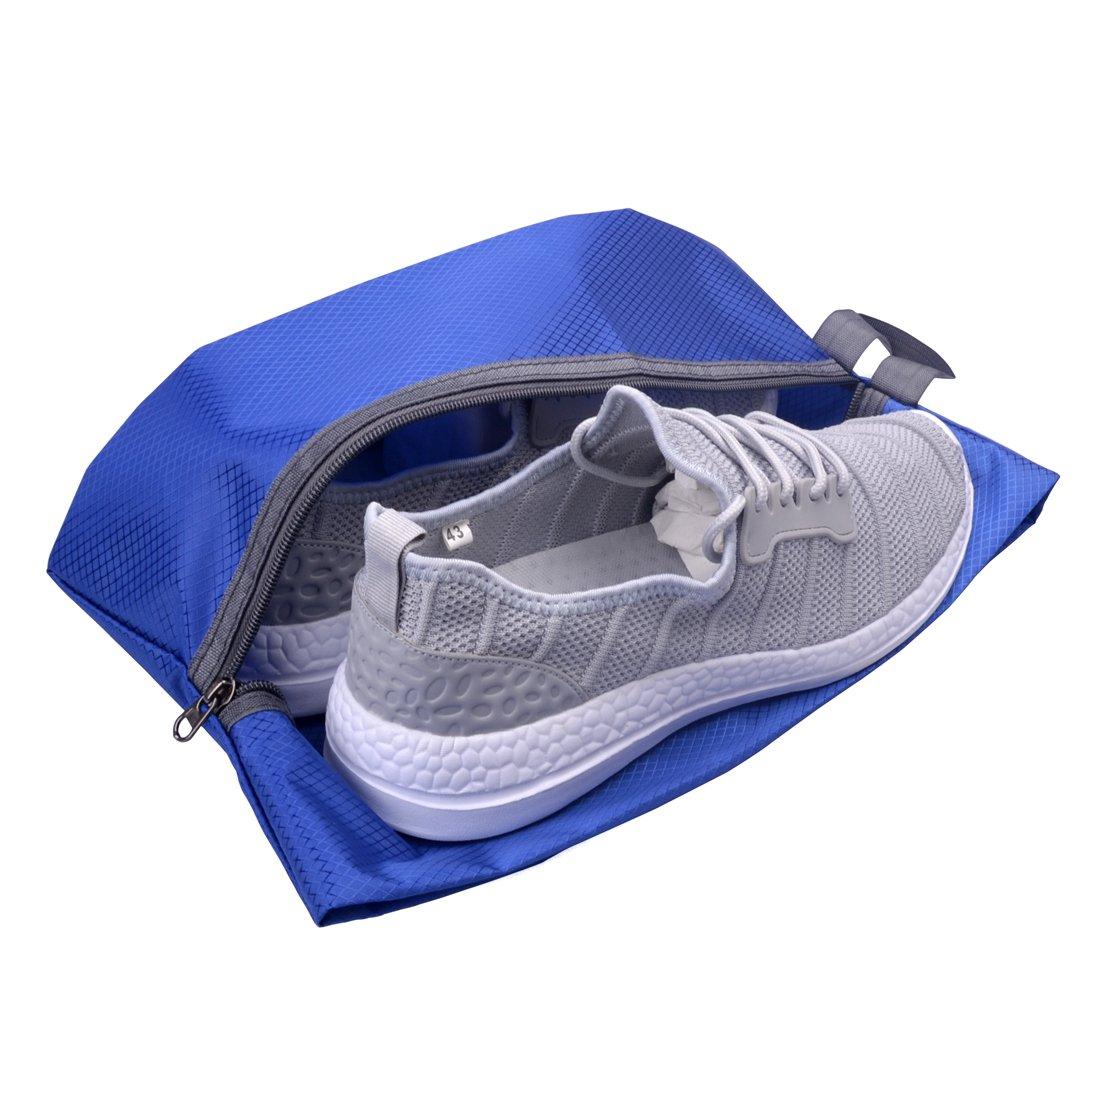 Enerhu 4Pcs Travel Shoe Bags Case Waterproof Dustproof Nylon Zipper Portable Set of 4 Shoe Storage Organizer Boots Sneakers High Heel Blue